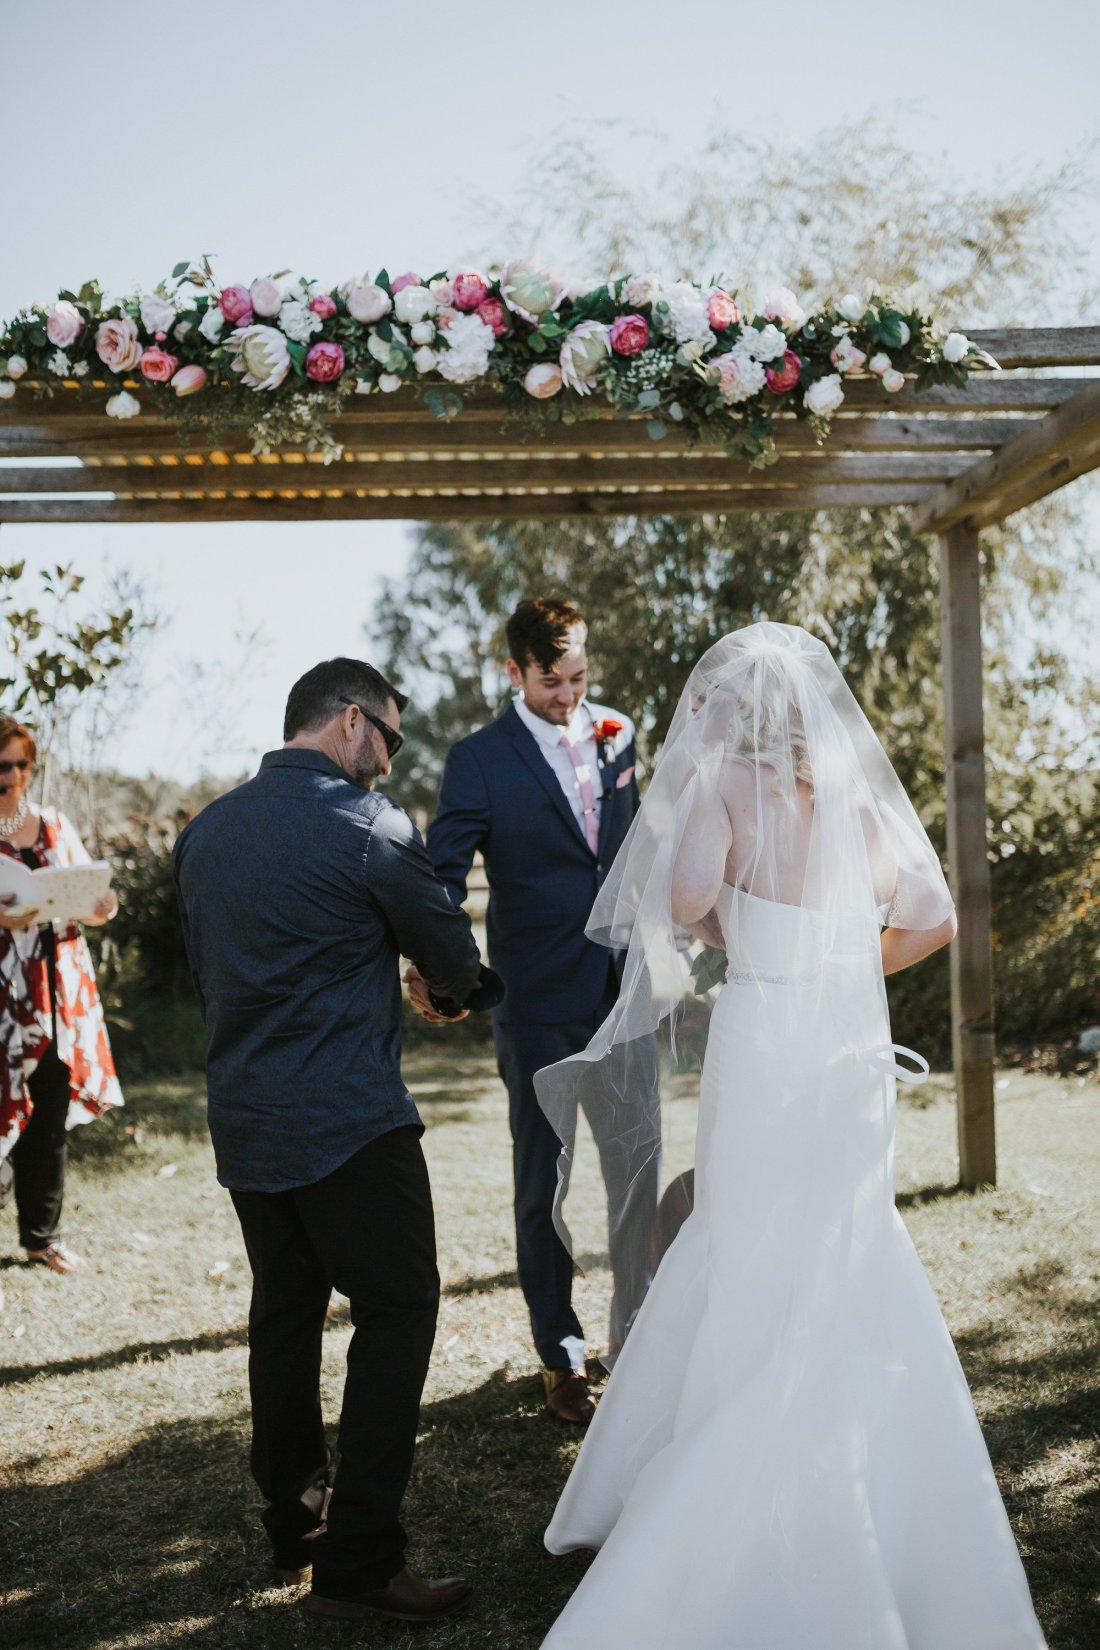 Perth Wedding Photographer | Ebony Blush Photography | Zoe Theiadore | K+T432